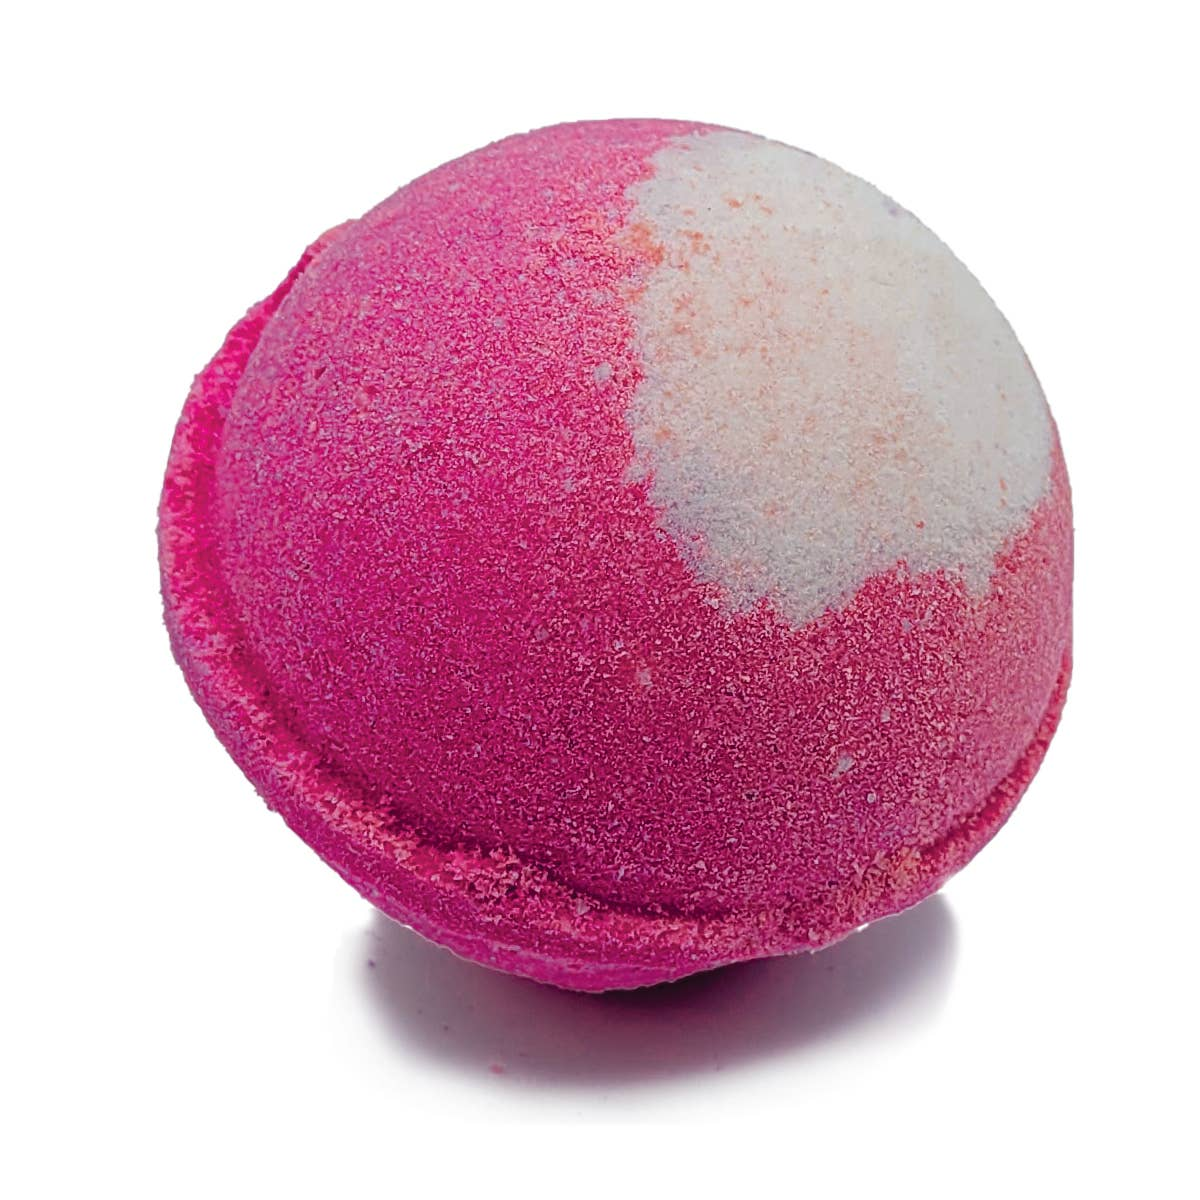 Evolve - Bath Bomb - Berry Smoothie | Trada Marketplace